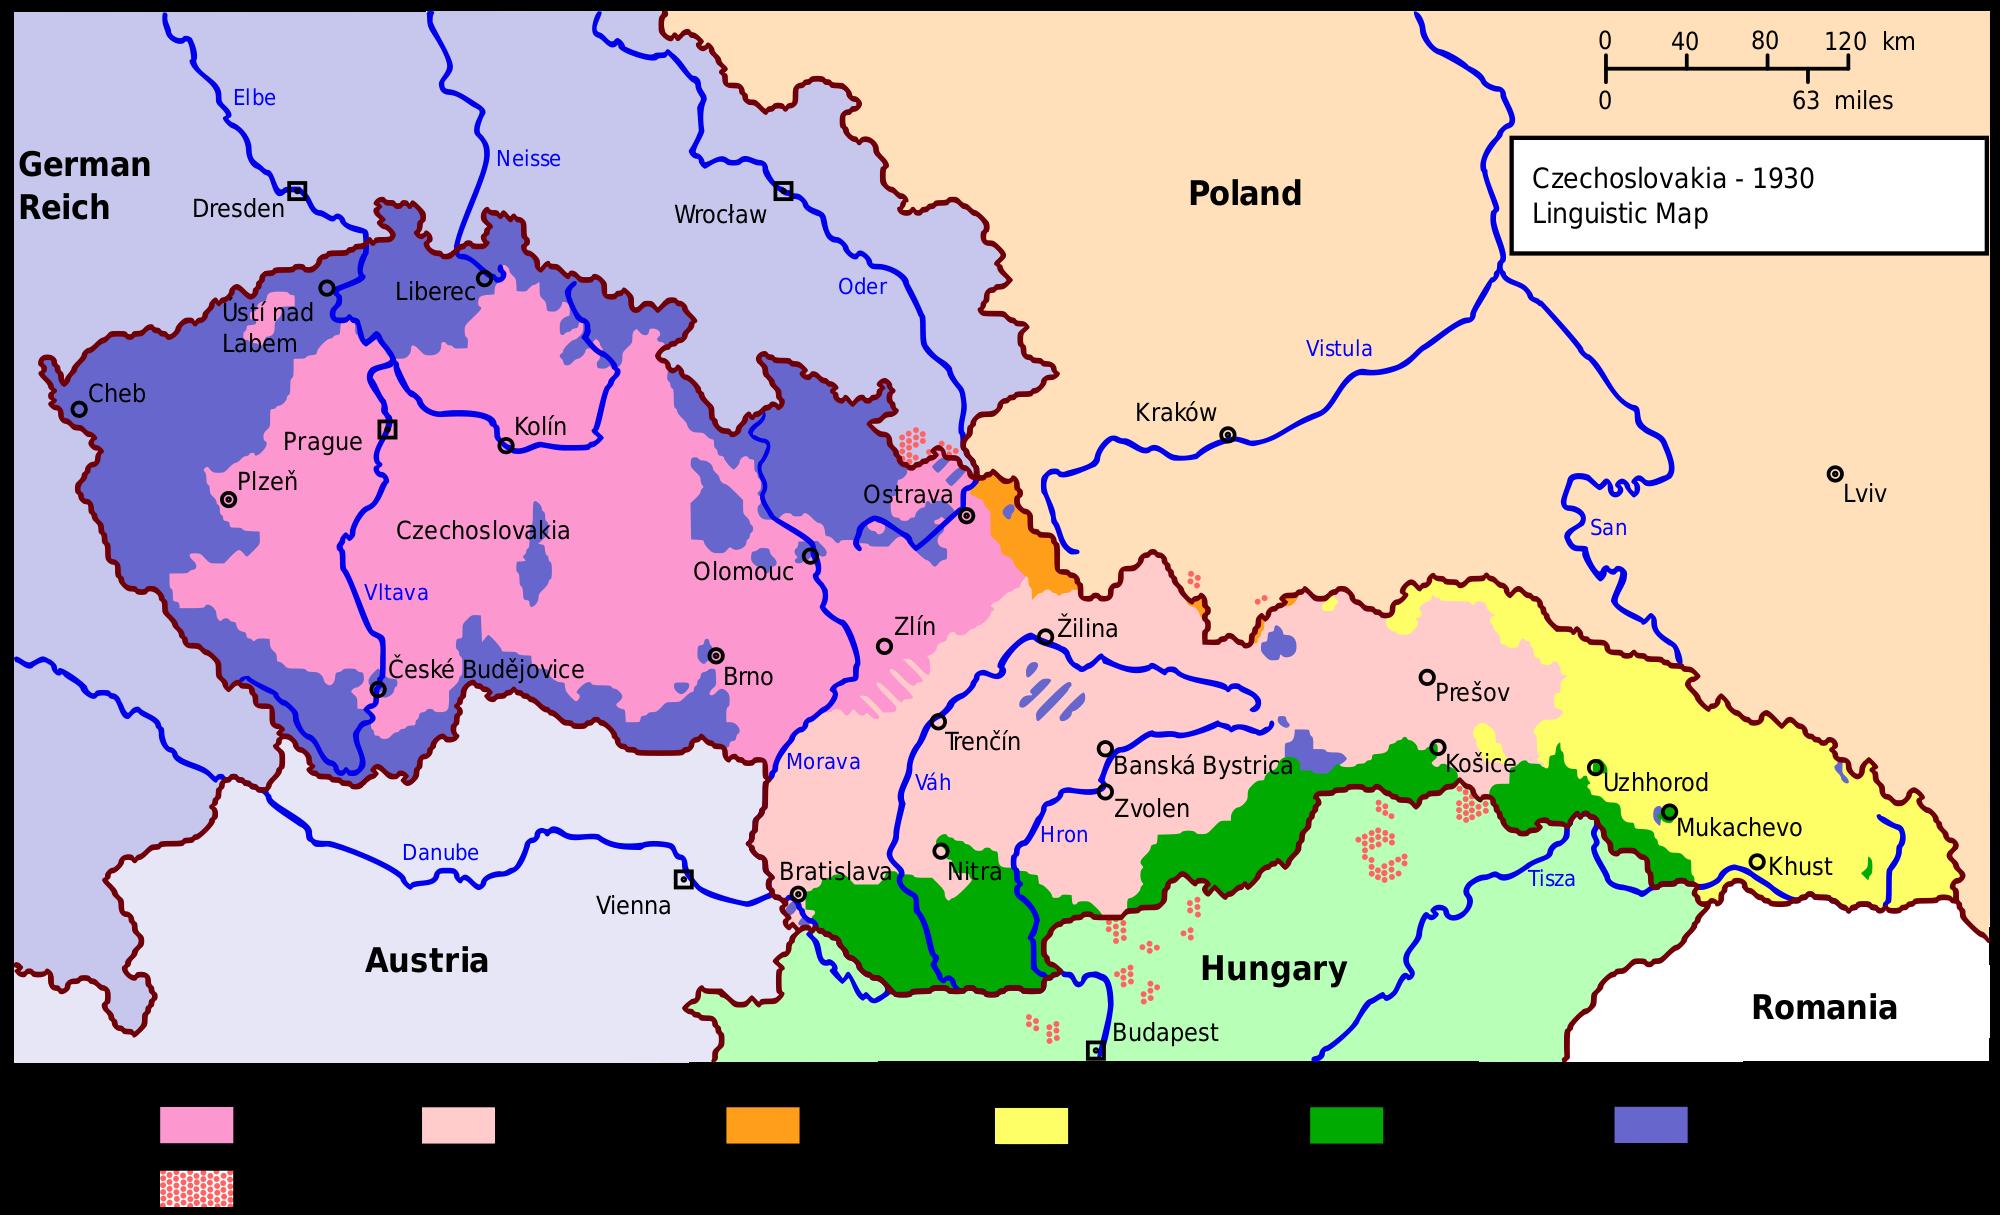 1930 Czechoslovakia Linguistic Map History Pinterest Map